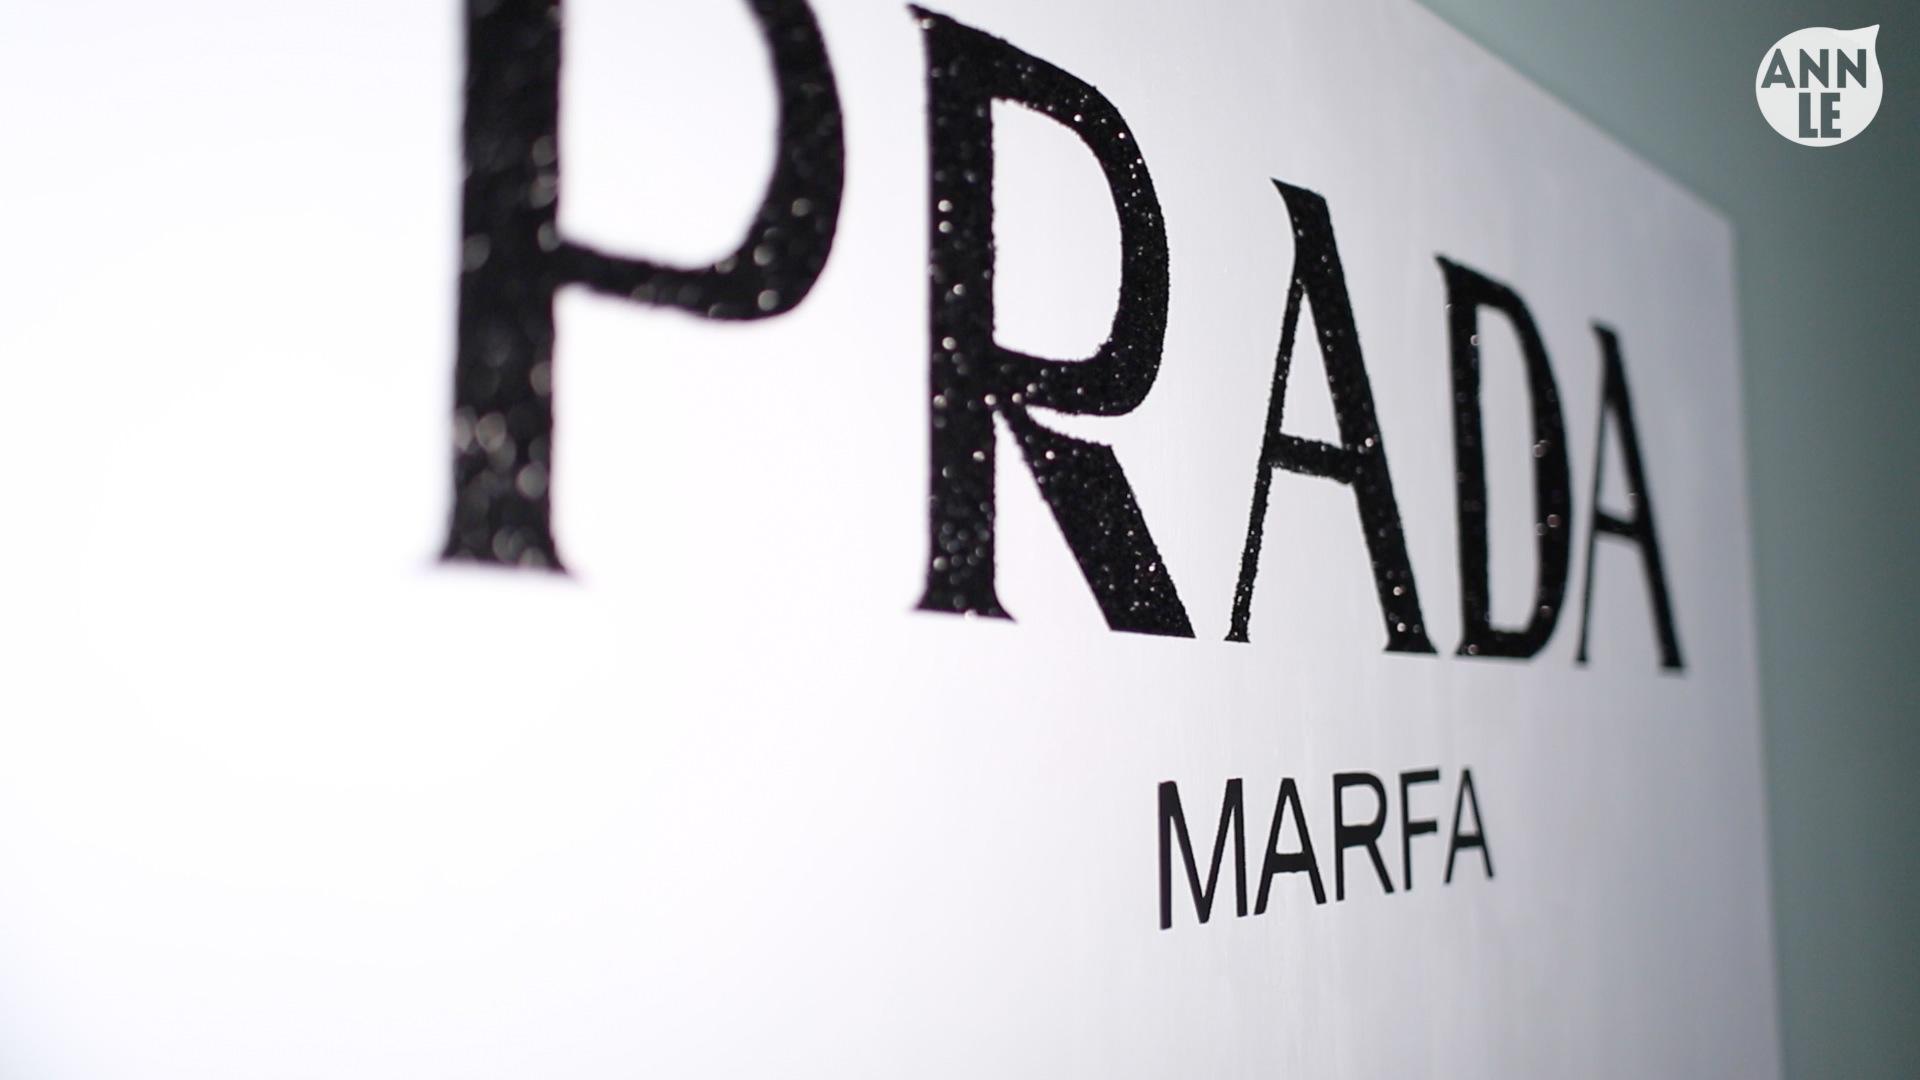 Gossip Girl Prada Wall Art – Ann Le Style with regard to Prada Wall Art